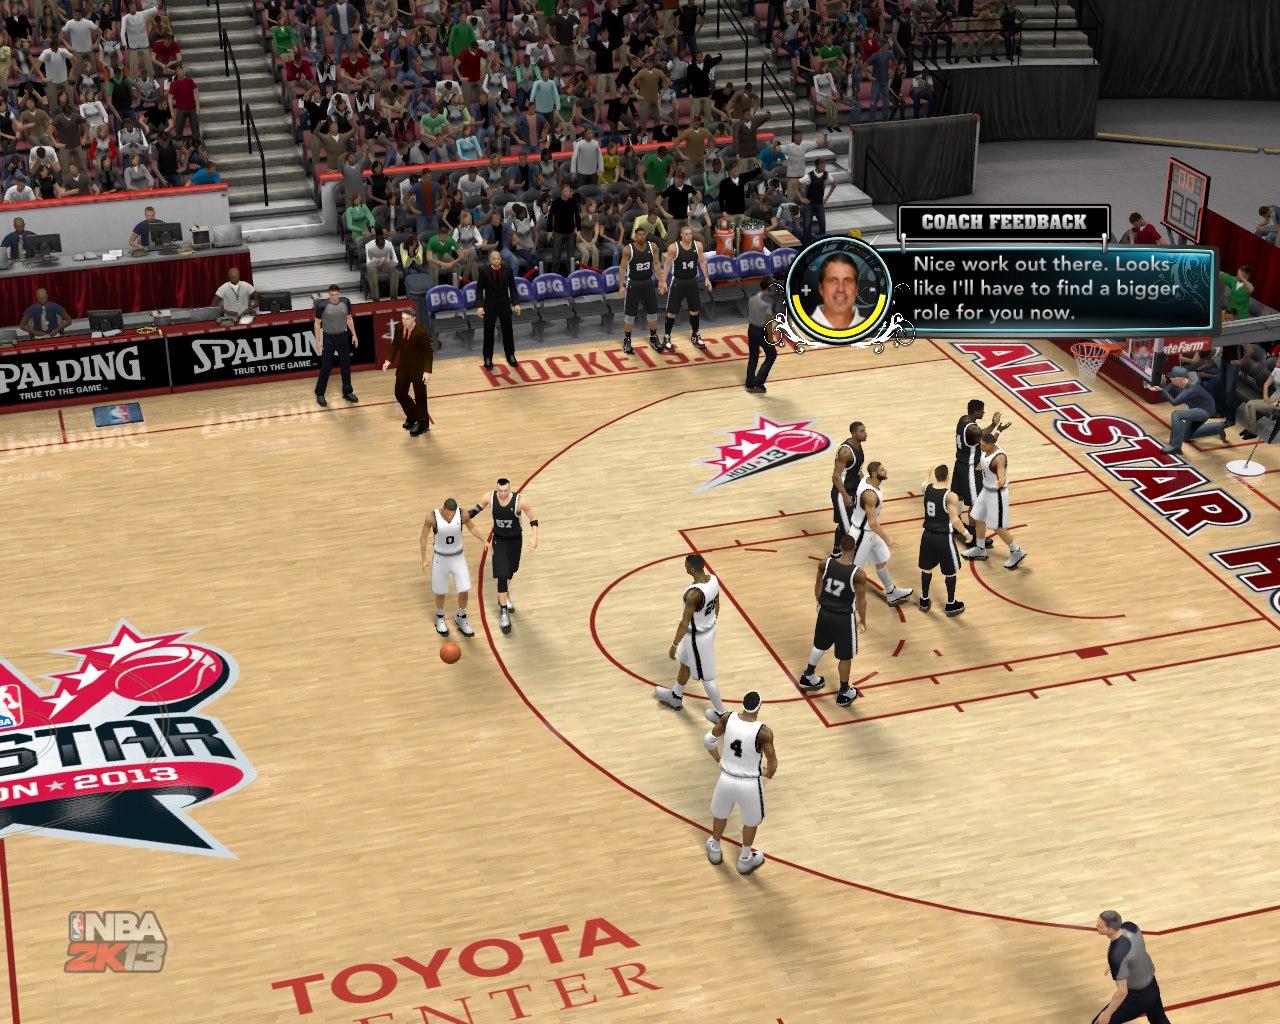 НБА2К13 скриншоты